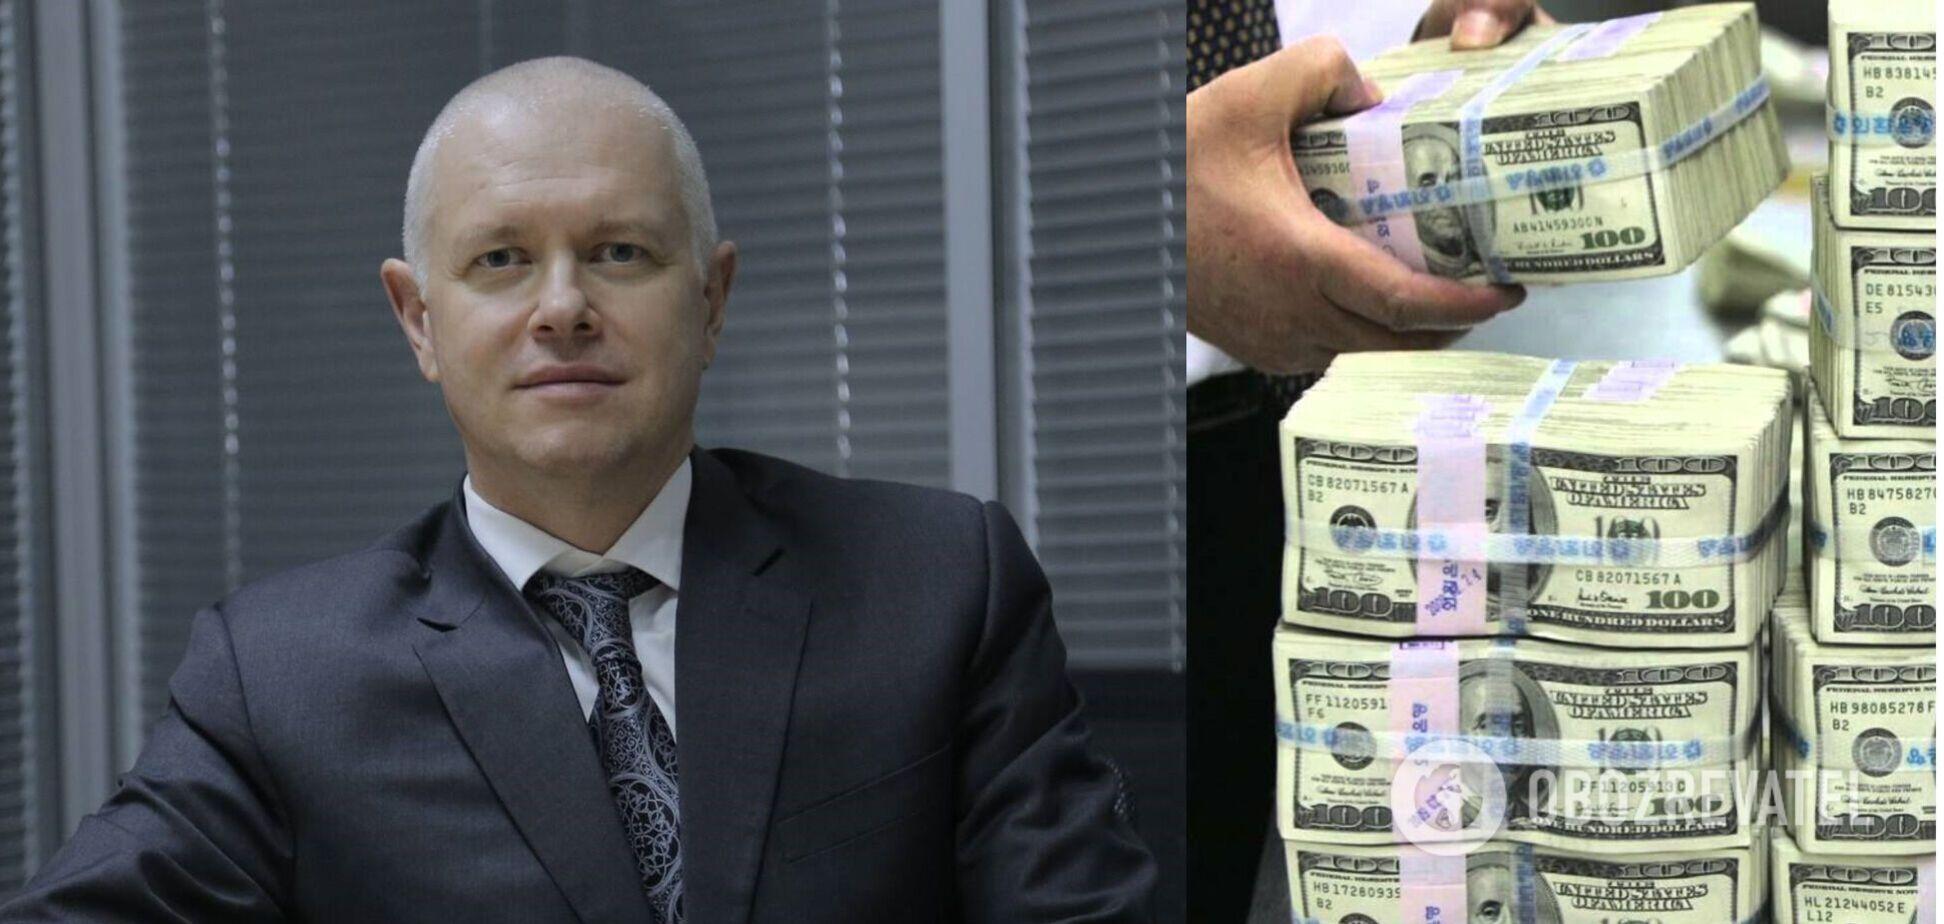 Дело ПриватБанка: суд арестовал $3 млн и активы Яценко